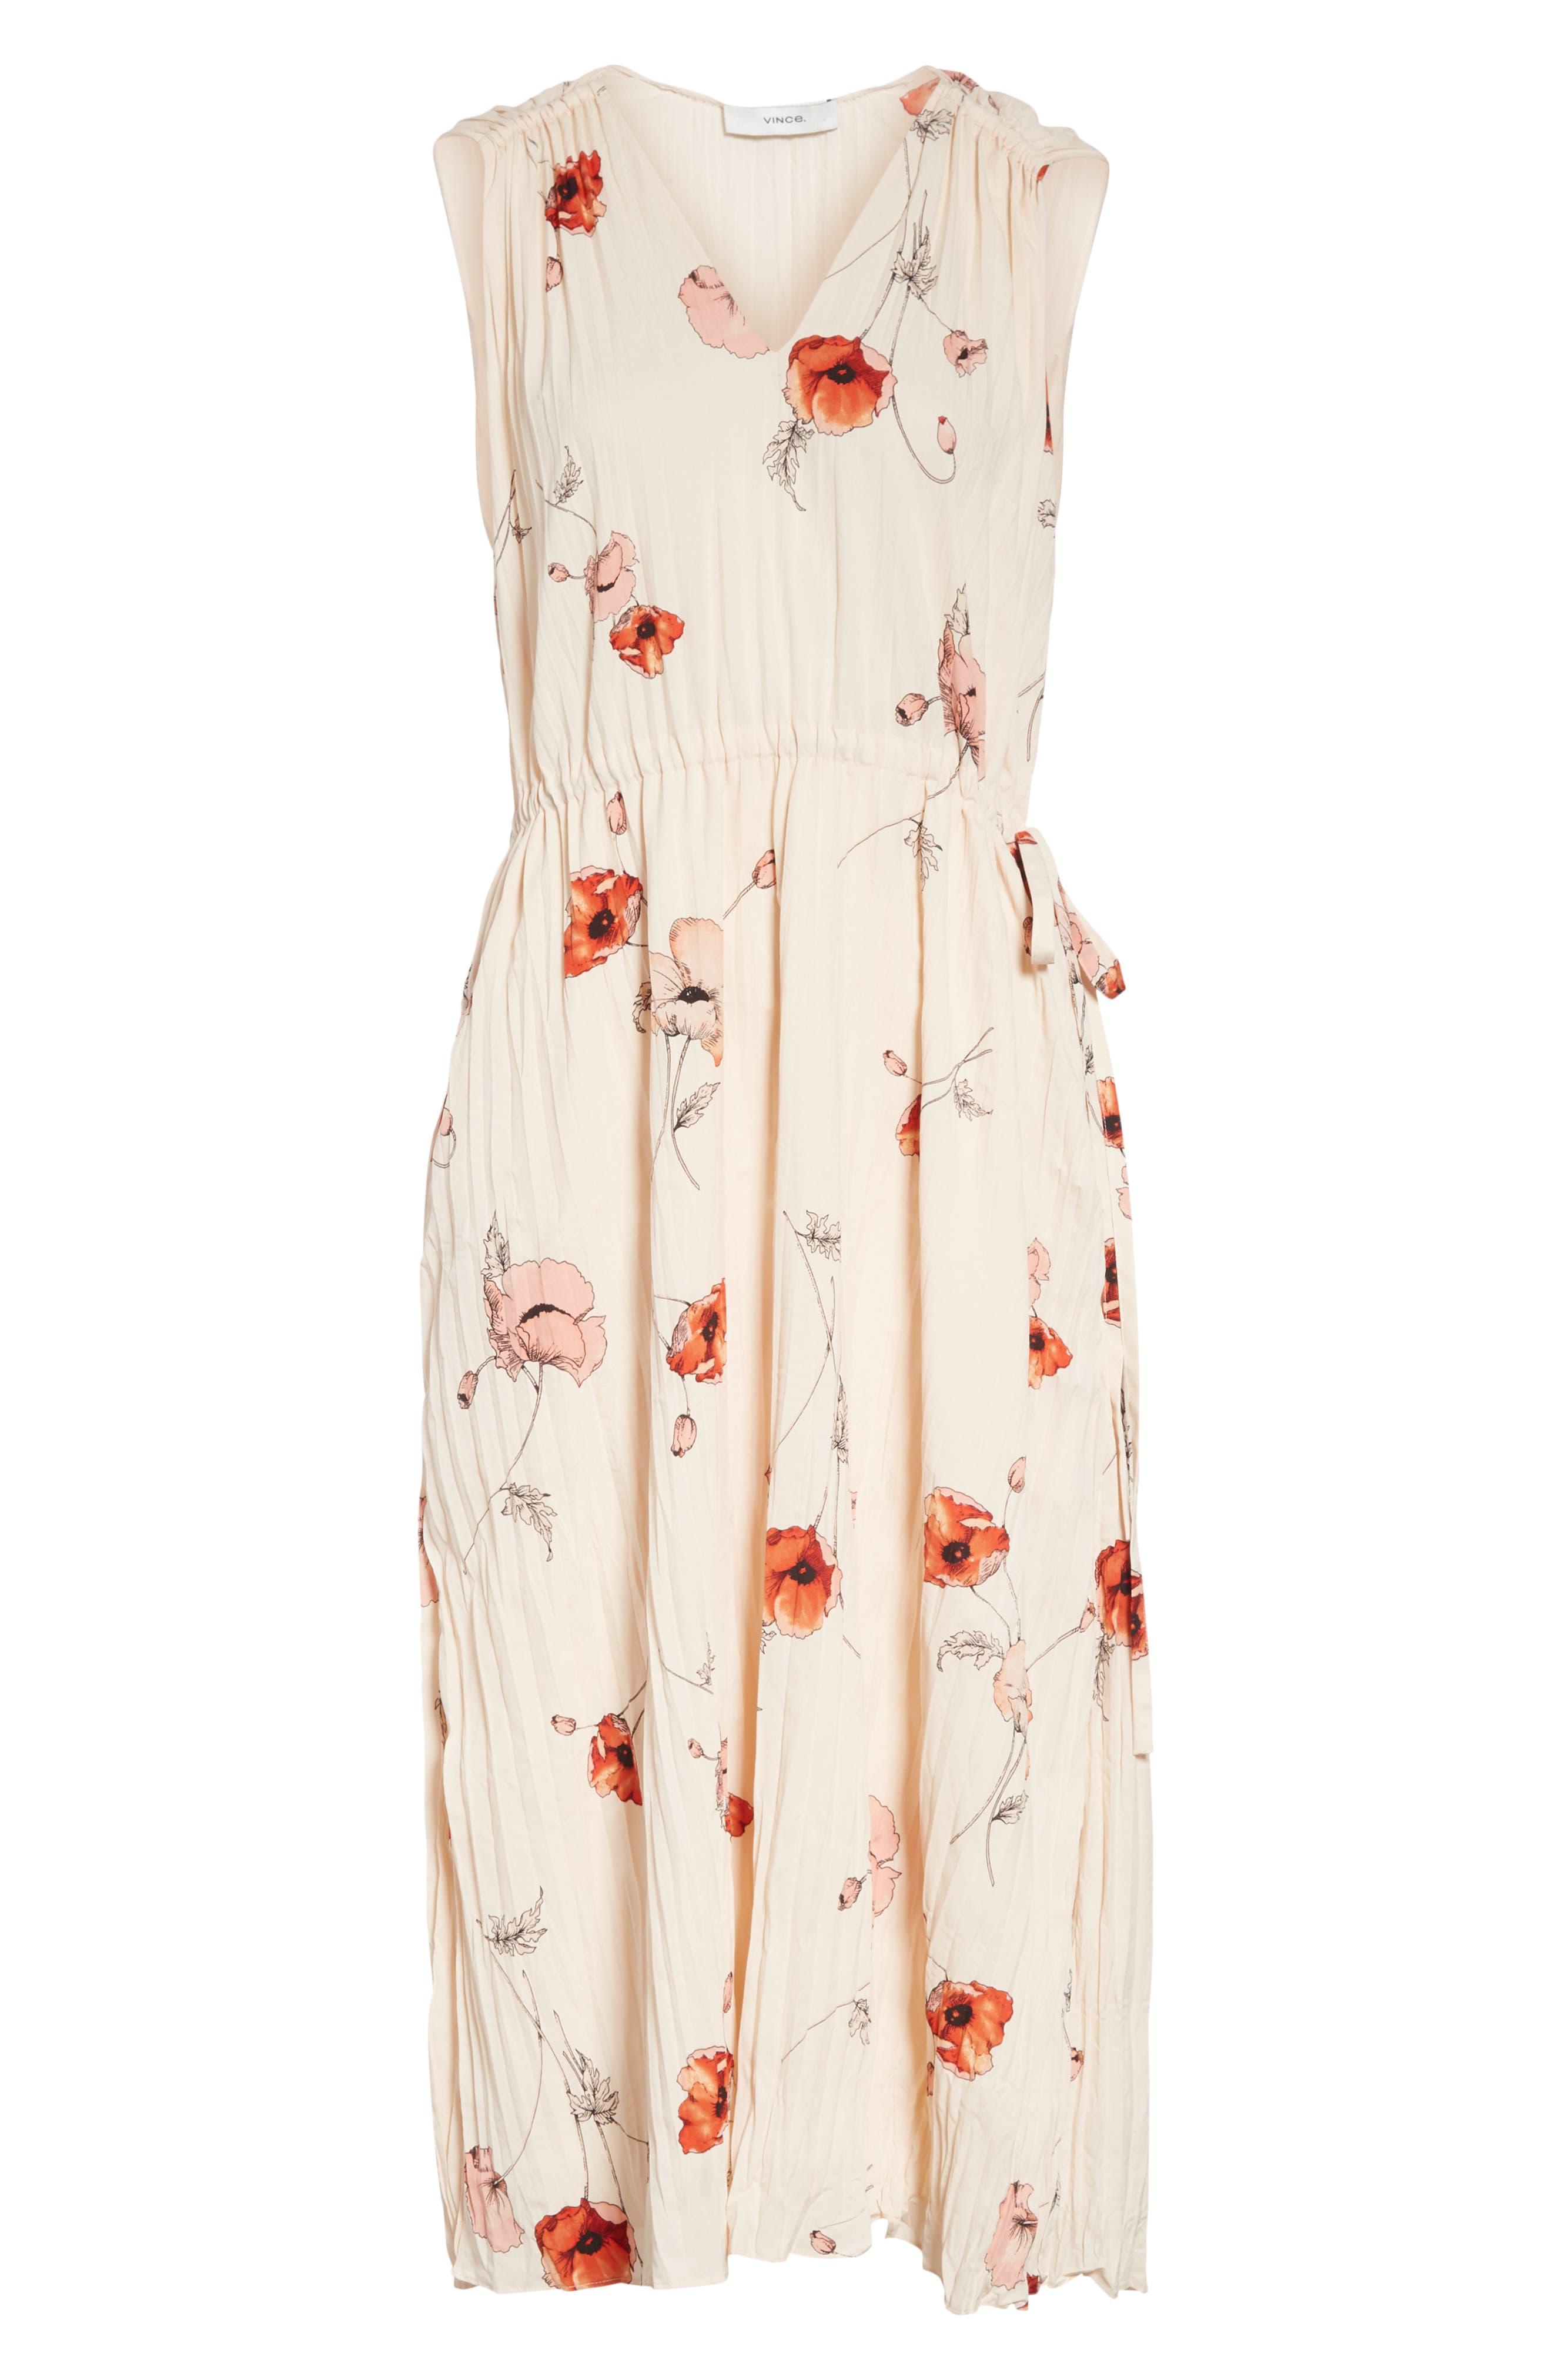 VINCE, Tossed Poppy Pleated Midi Dress, Alternate thumbnail 7, color, PALE BLUSH